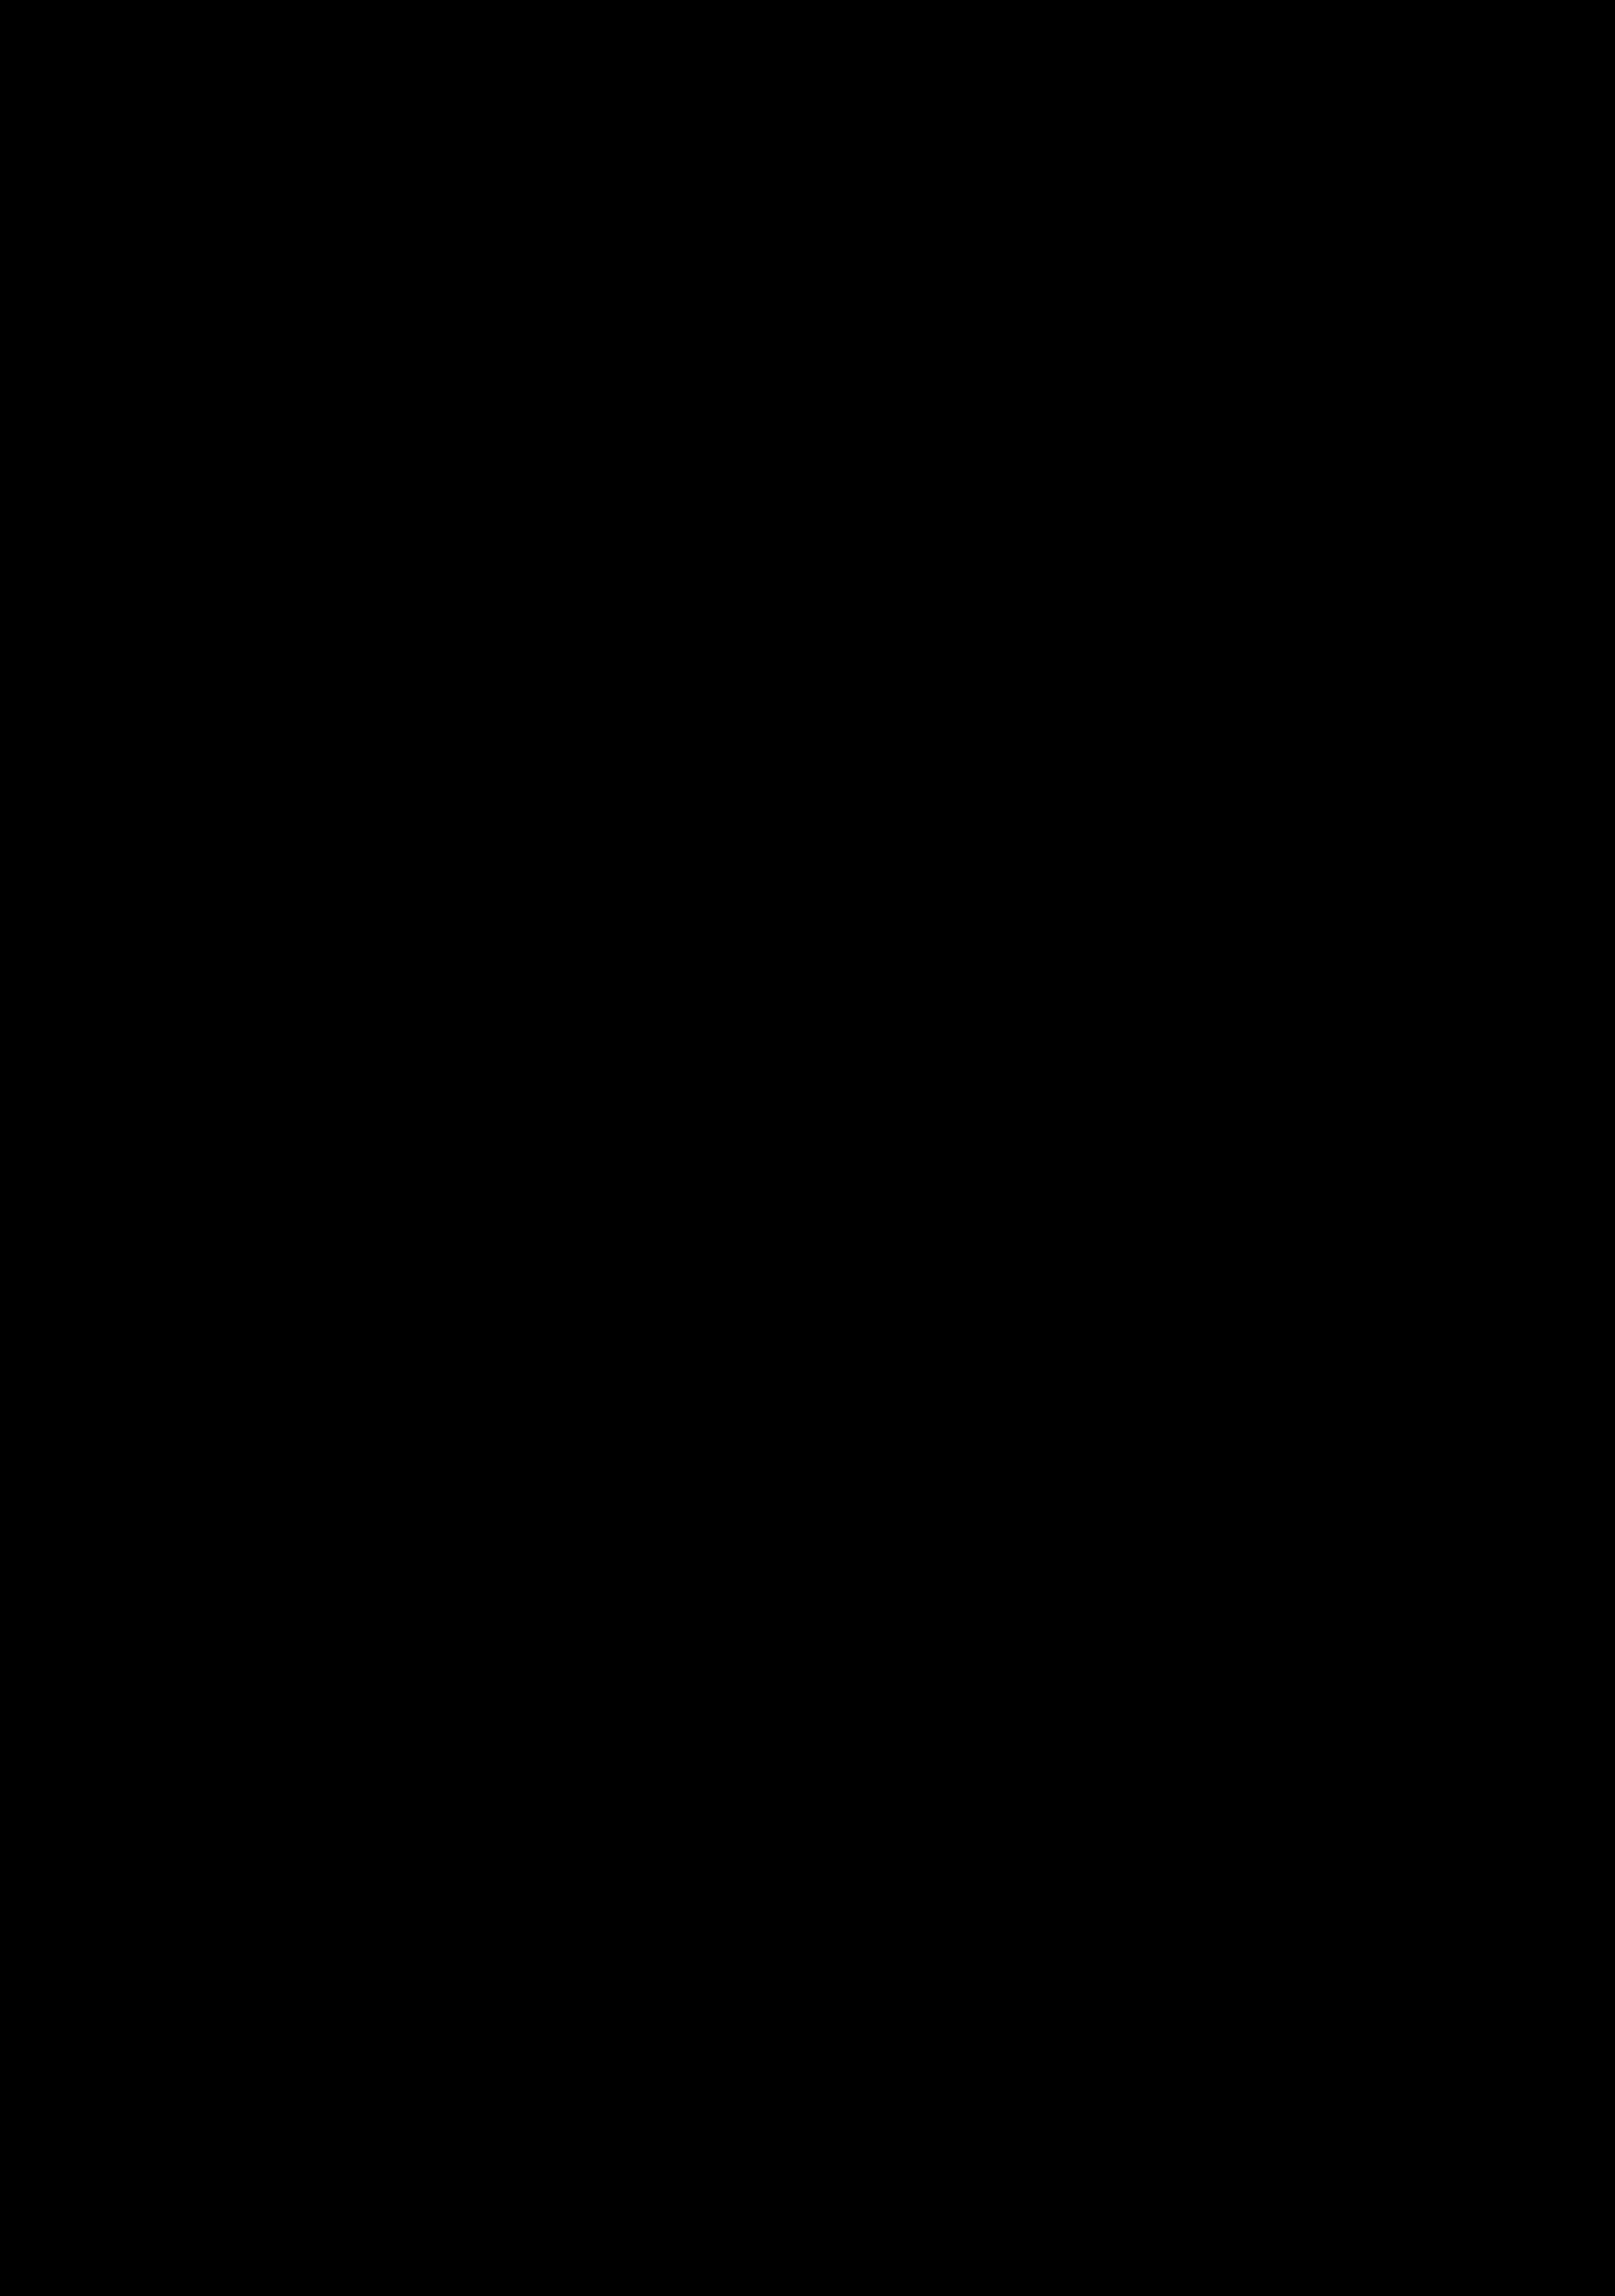 Будильник PNG